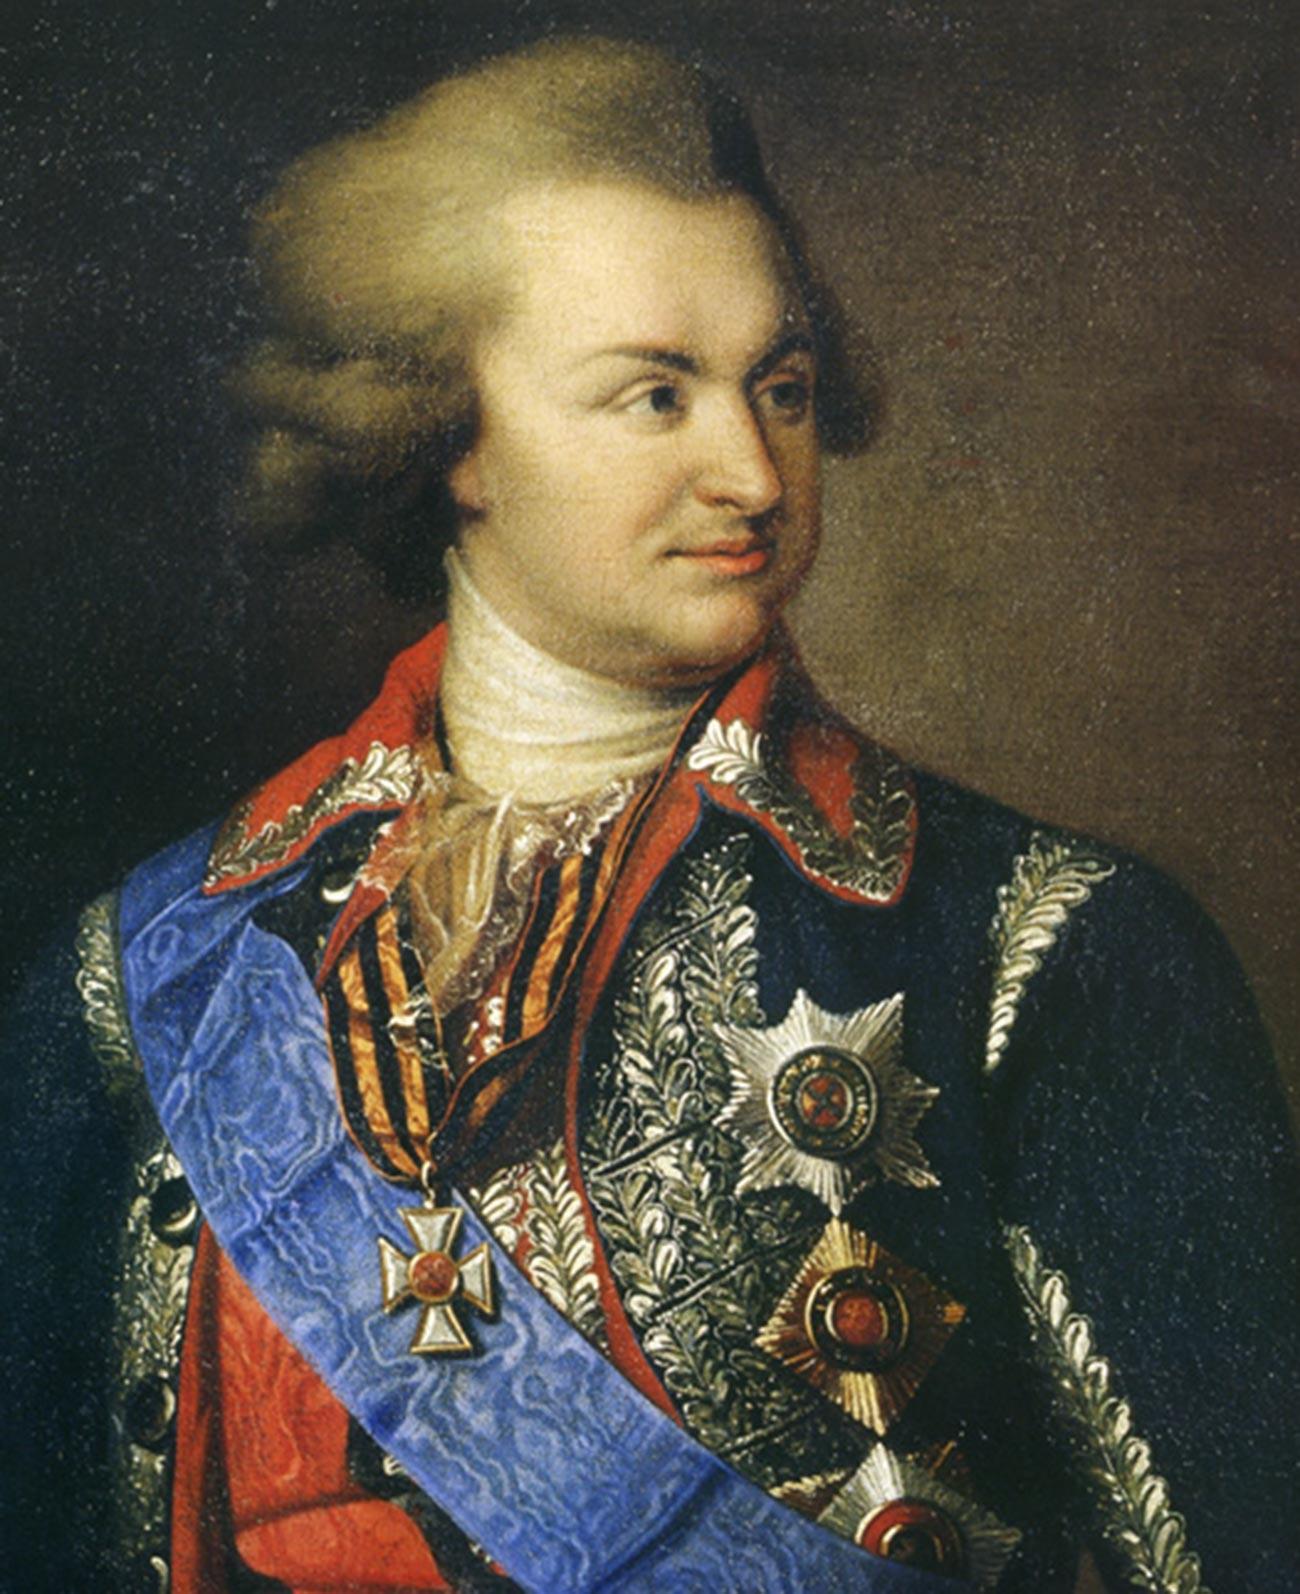 Grigori Potemkine